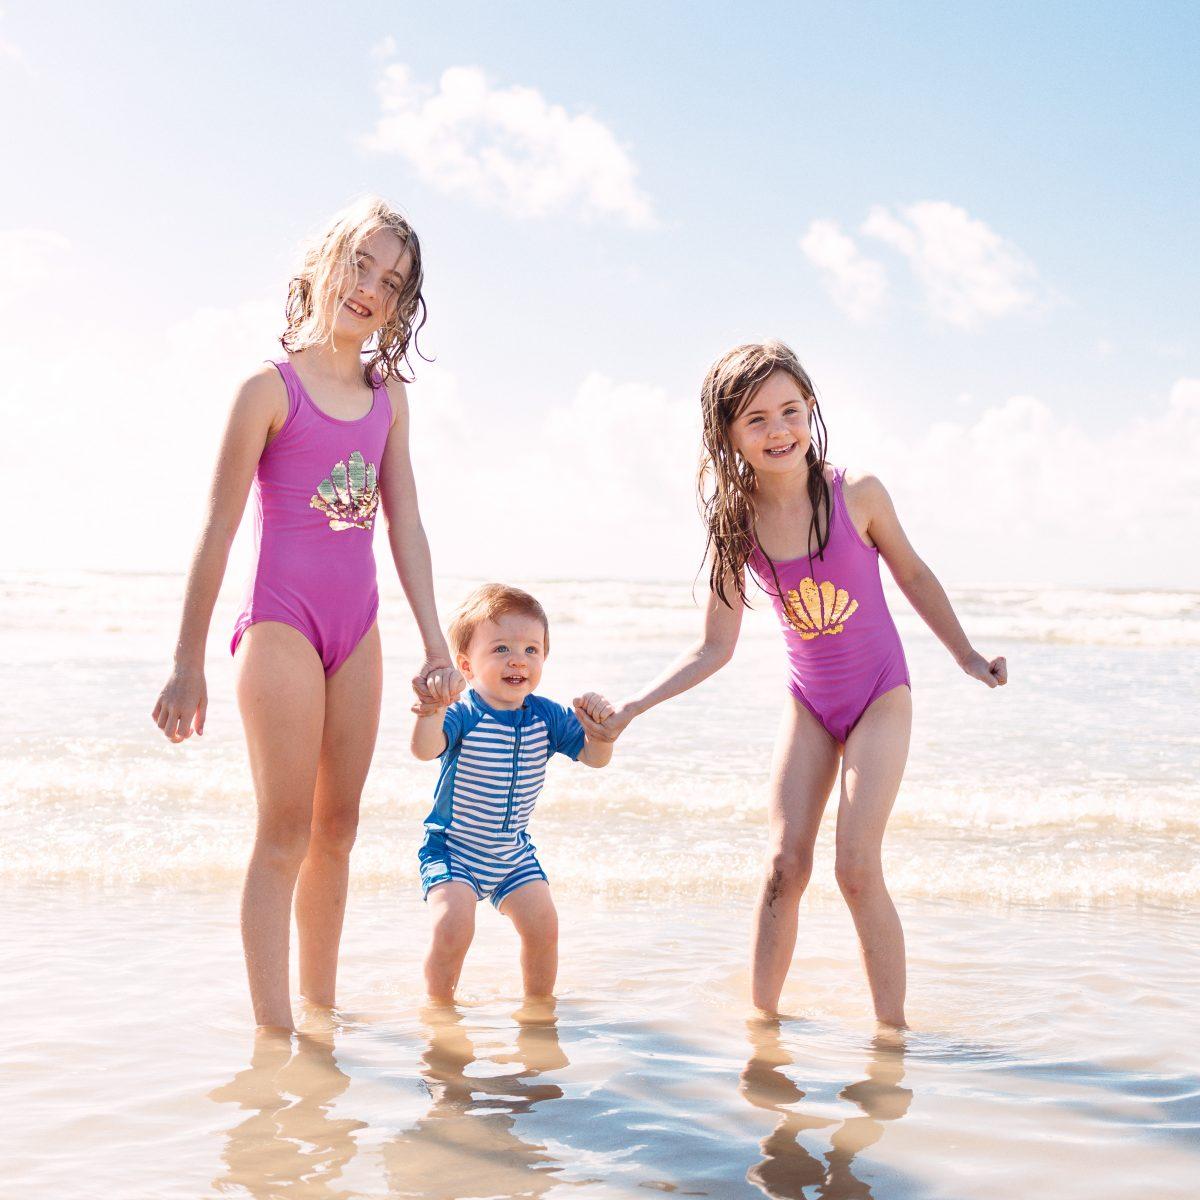 Port Aransas Beach - family road trip to Port Aransas 2020